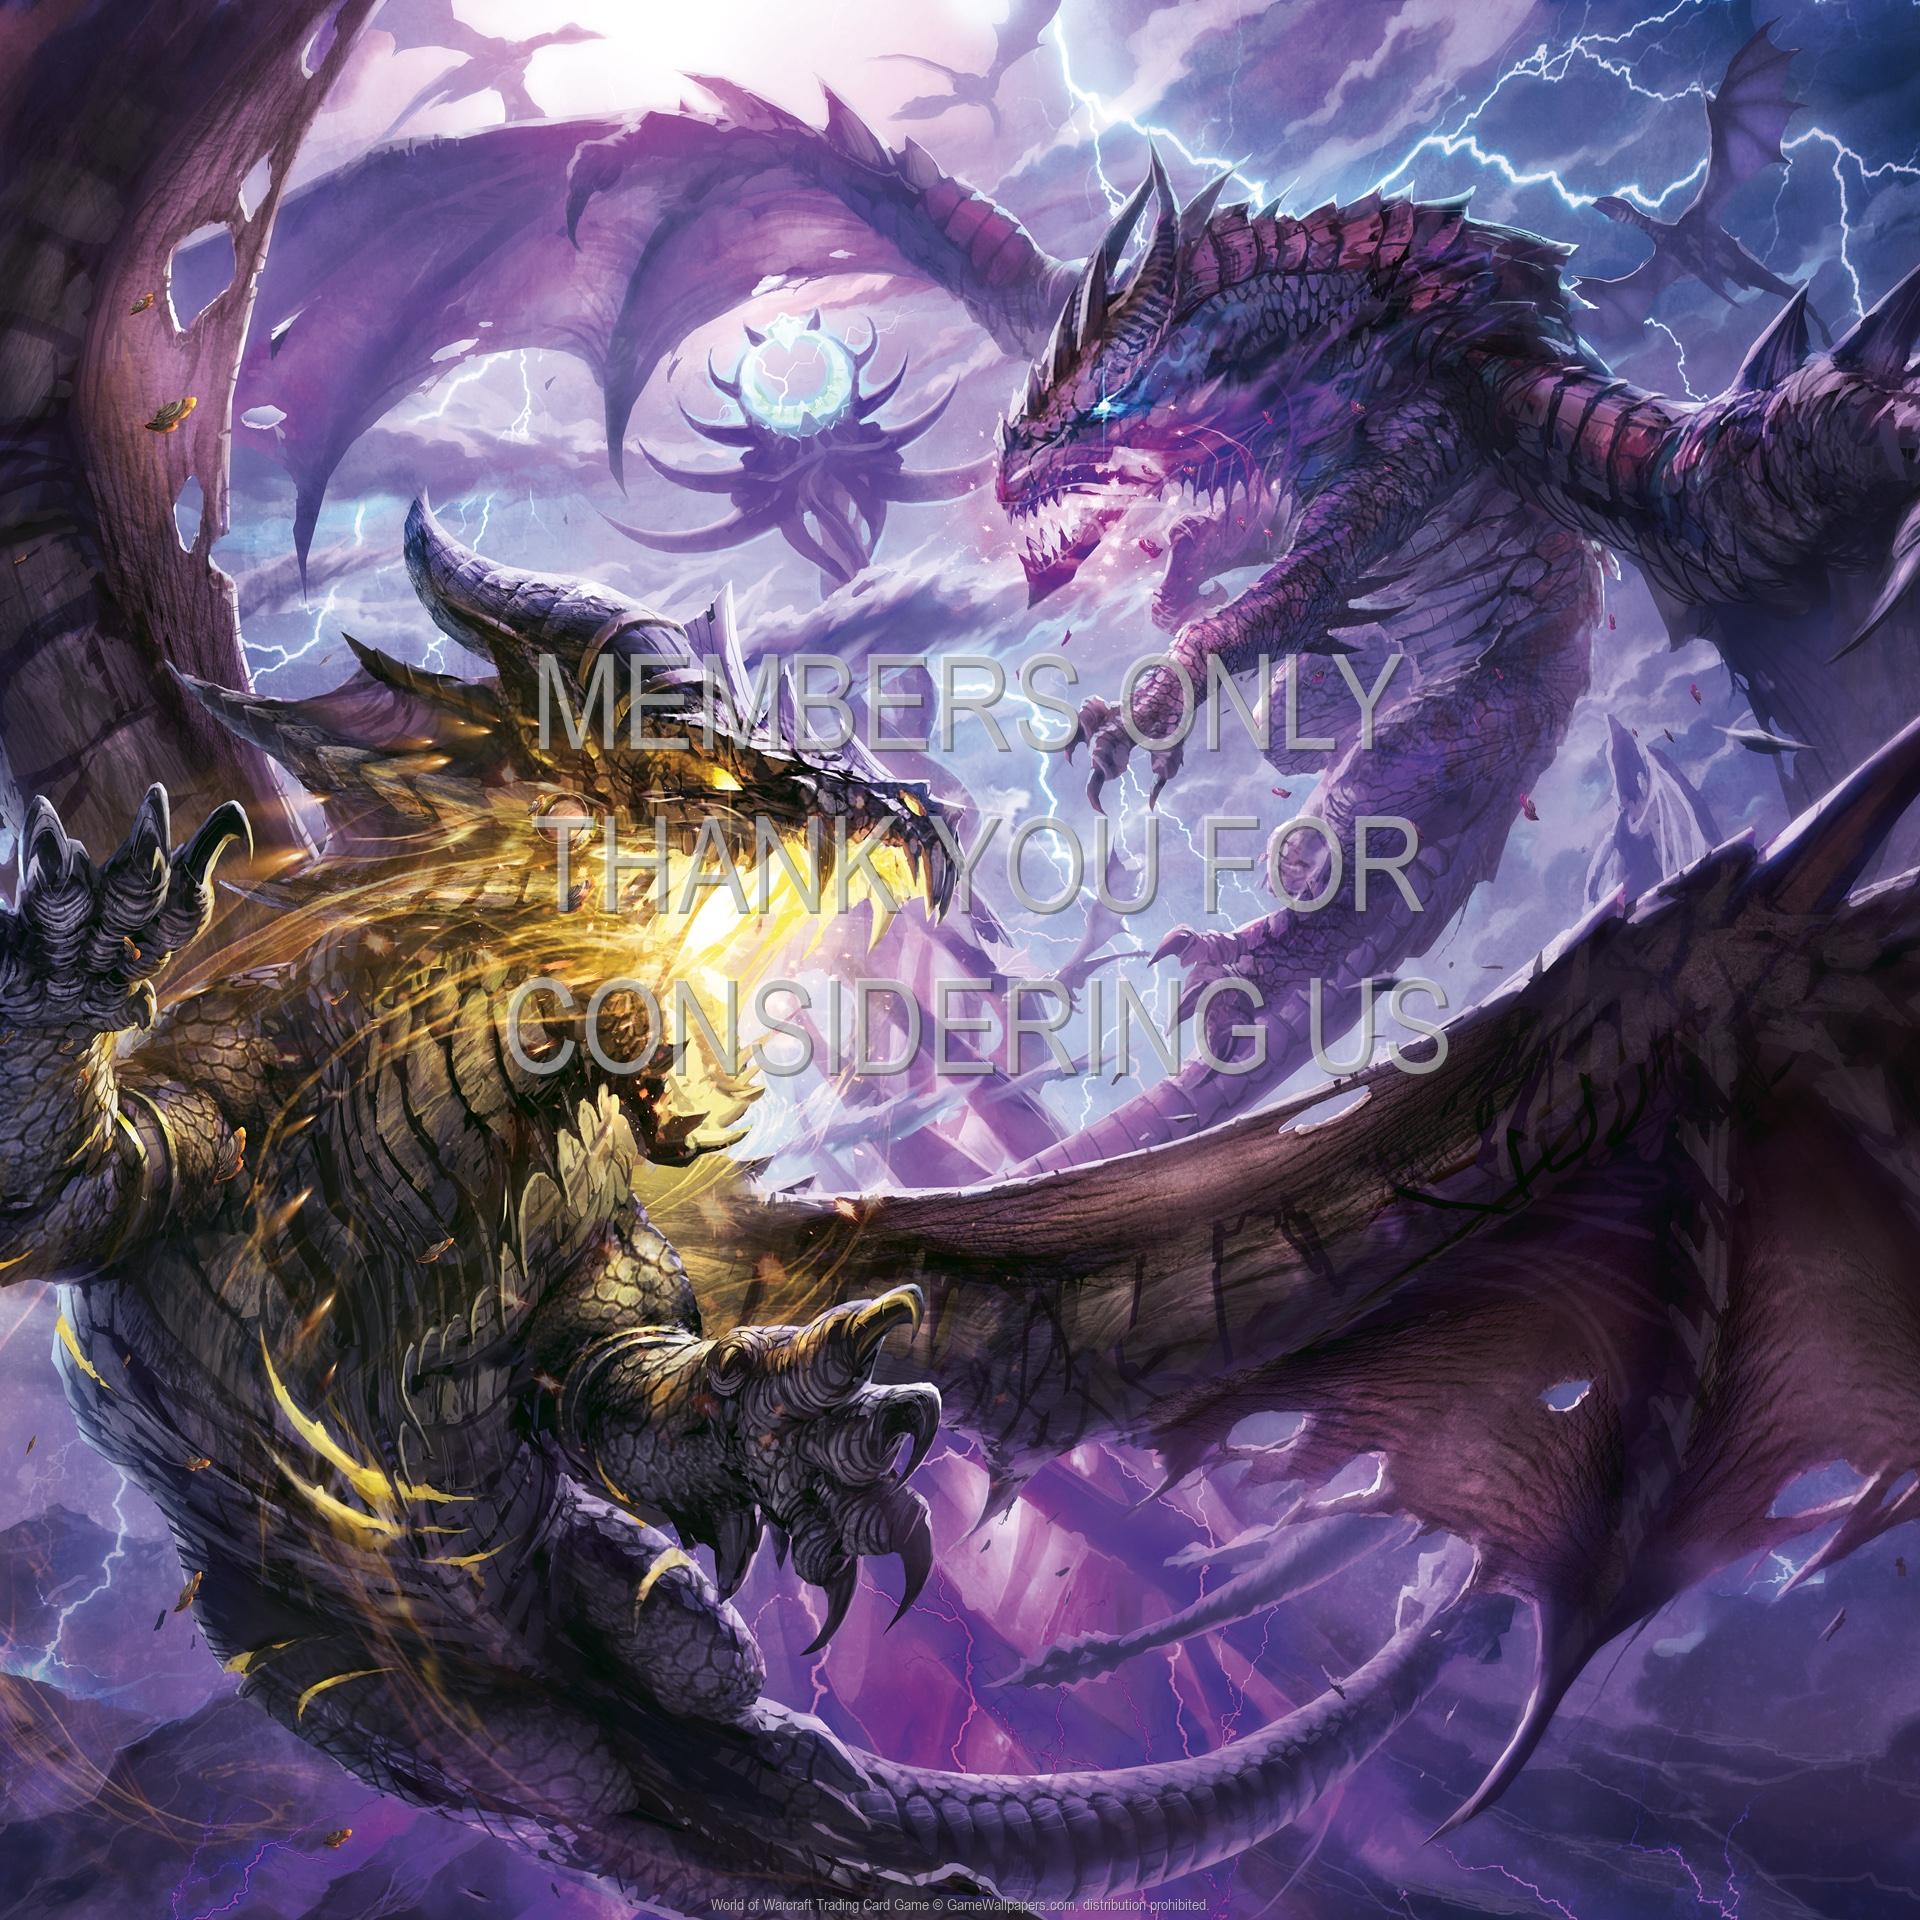 World of Warcraft: Trading Card Game 1920x1080 Handy Hintergrundbild 56